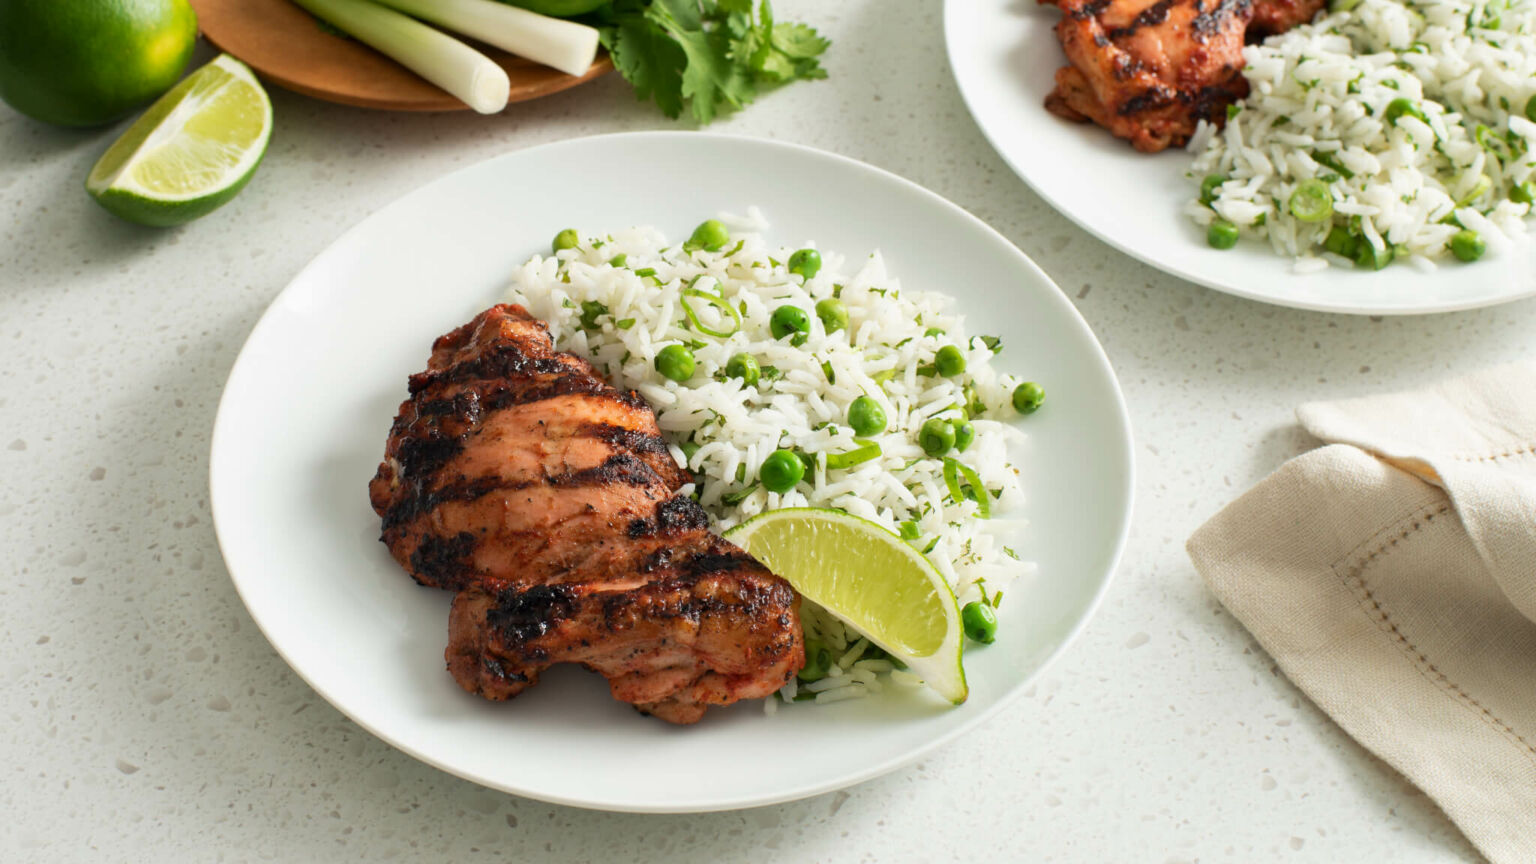 Herbed Basmati Rice with Grilled Tandoori Chicken